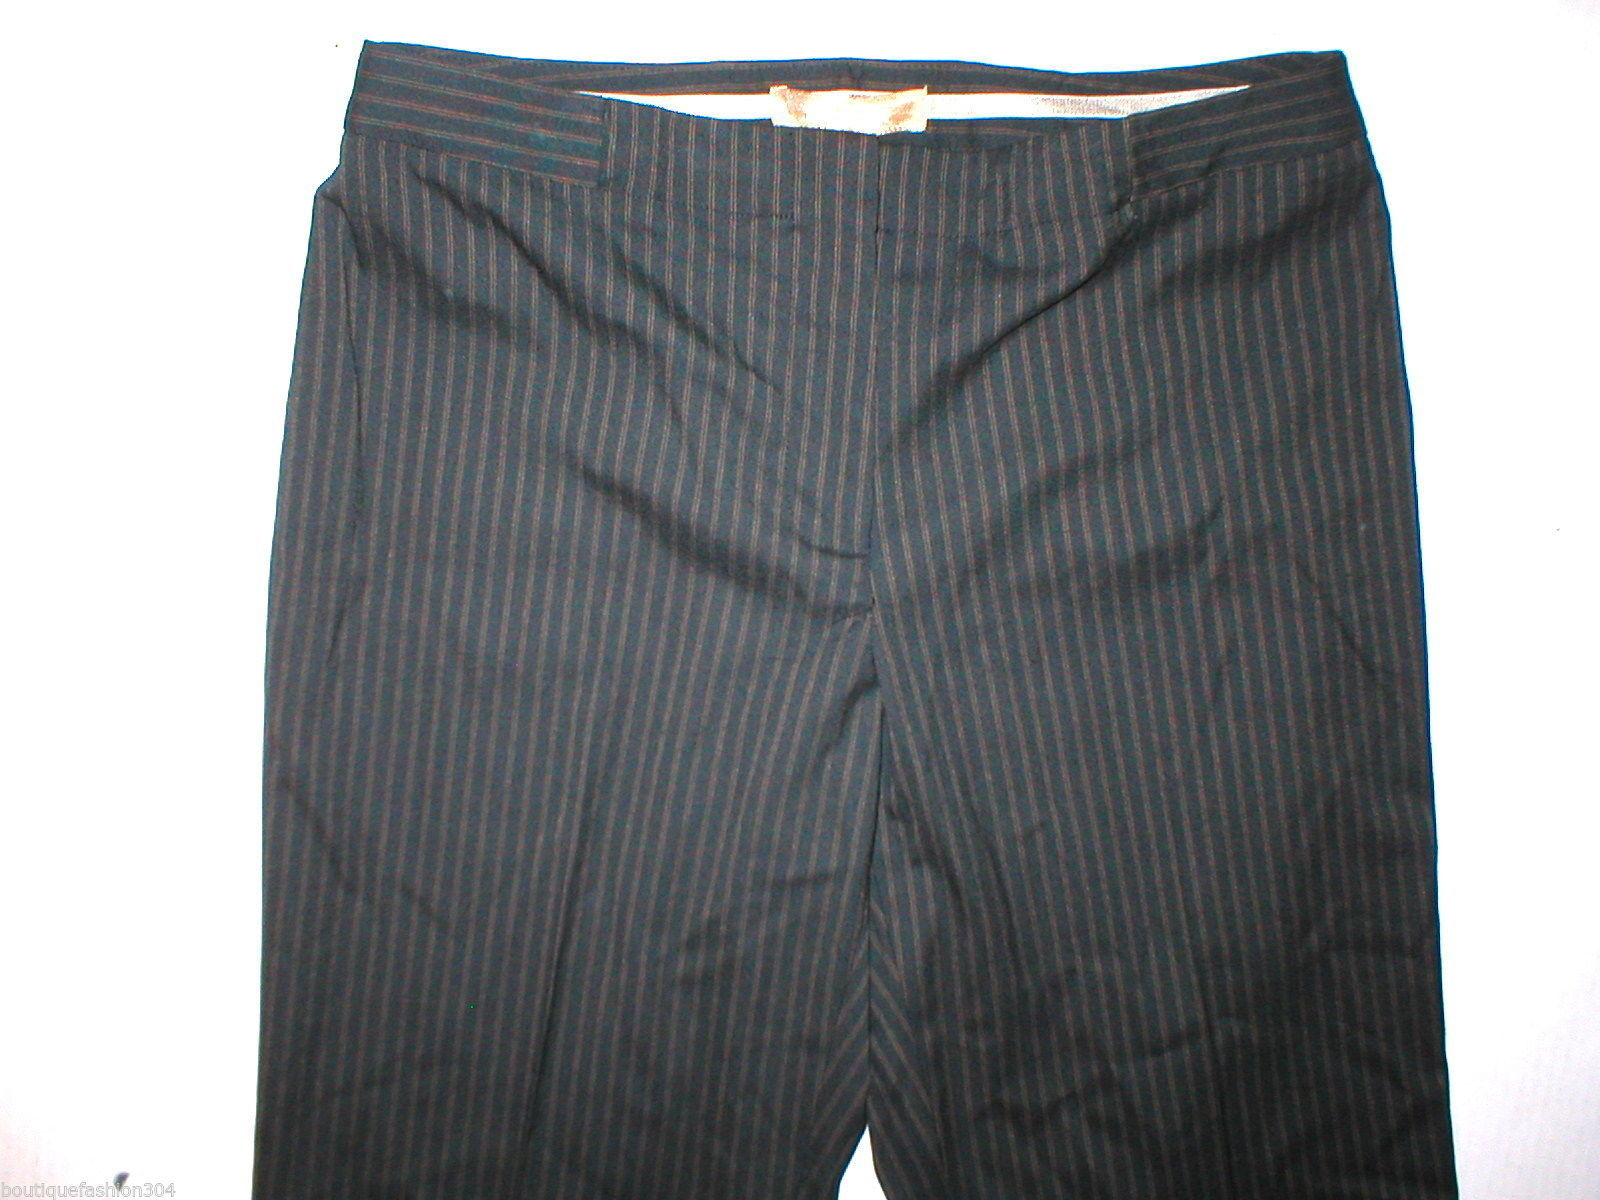 NWT $100 Ellen Tracy Straight Leg Pants Work 6 Black Stripes 30 X 32 Womens New